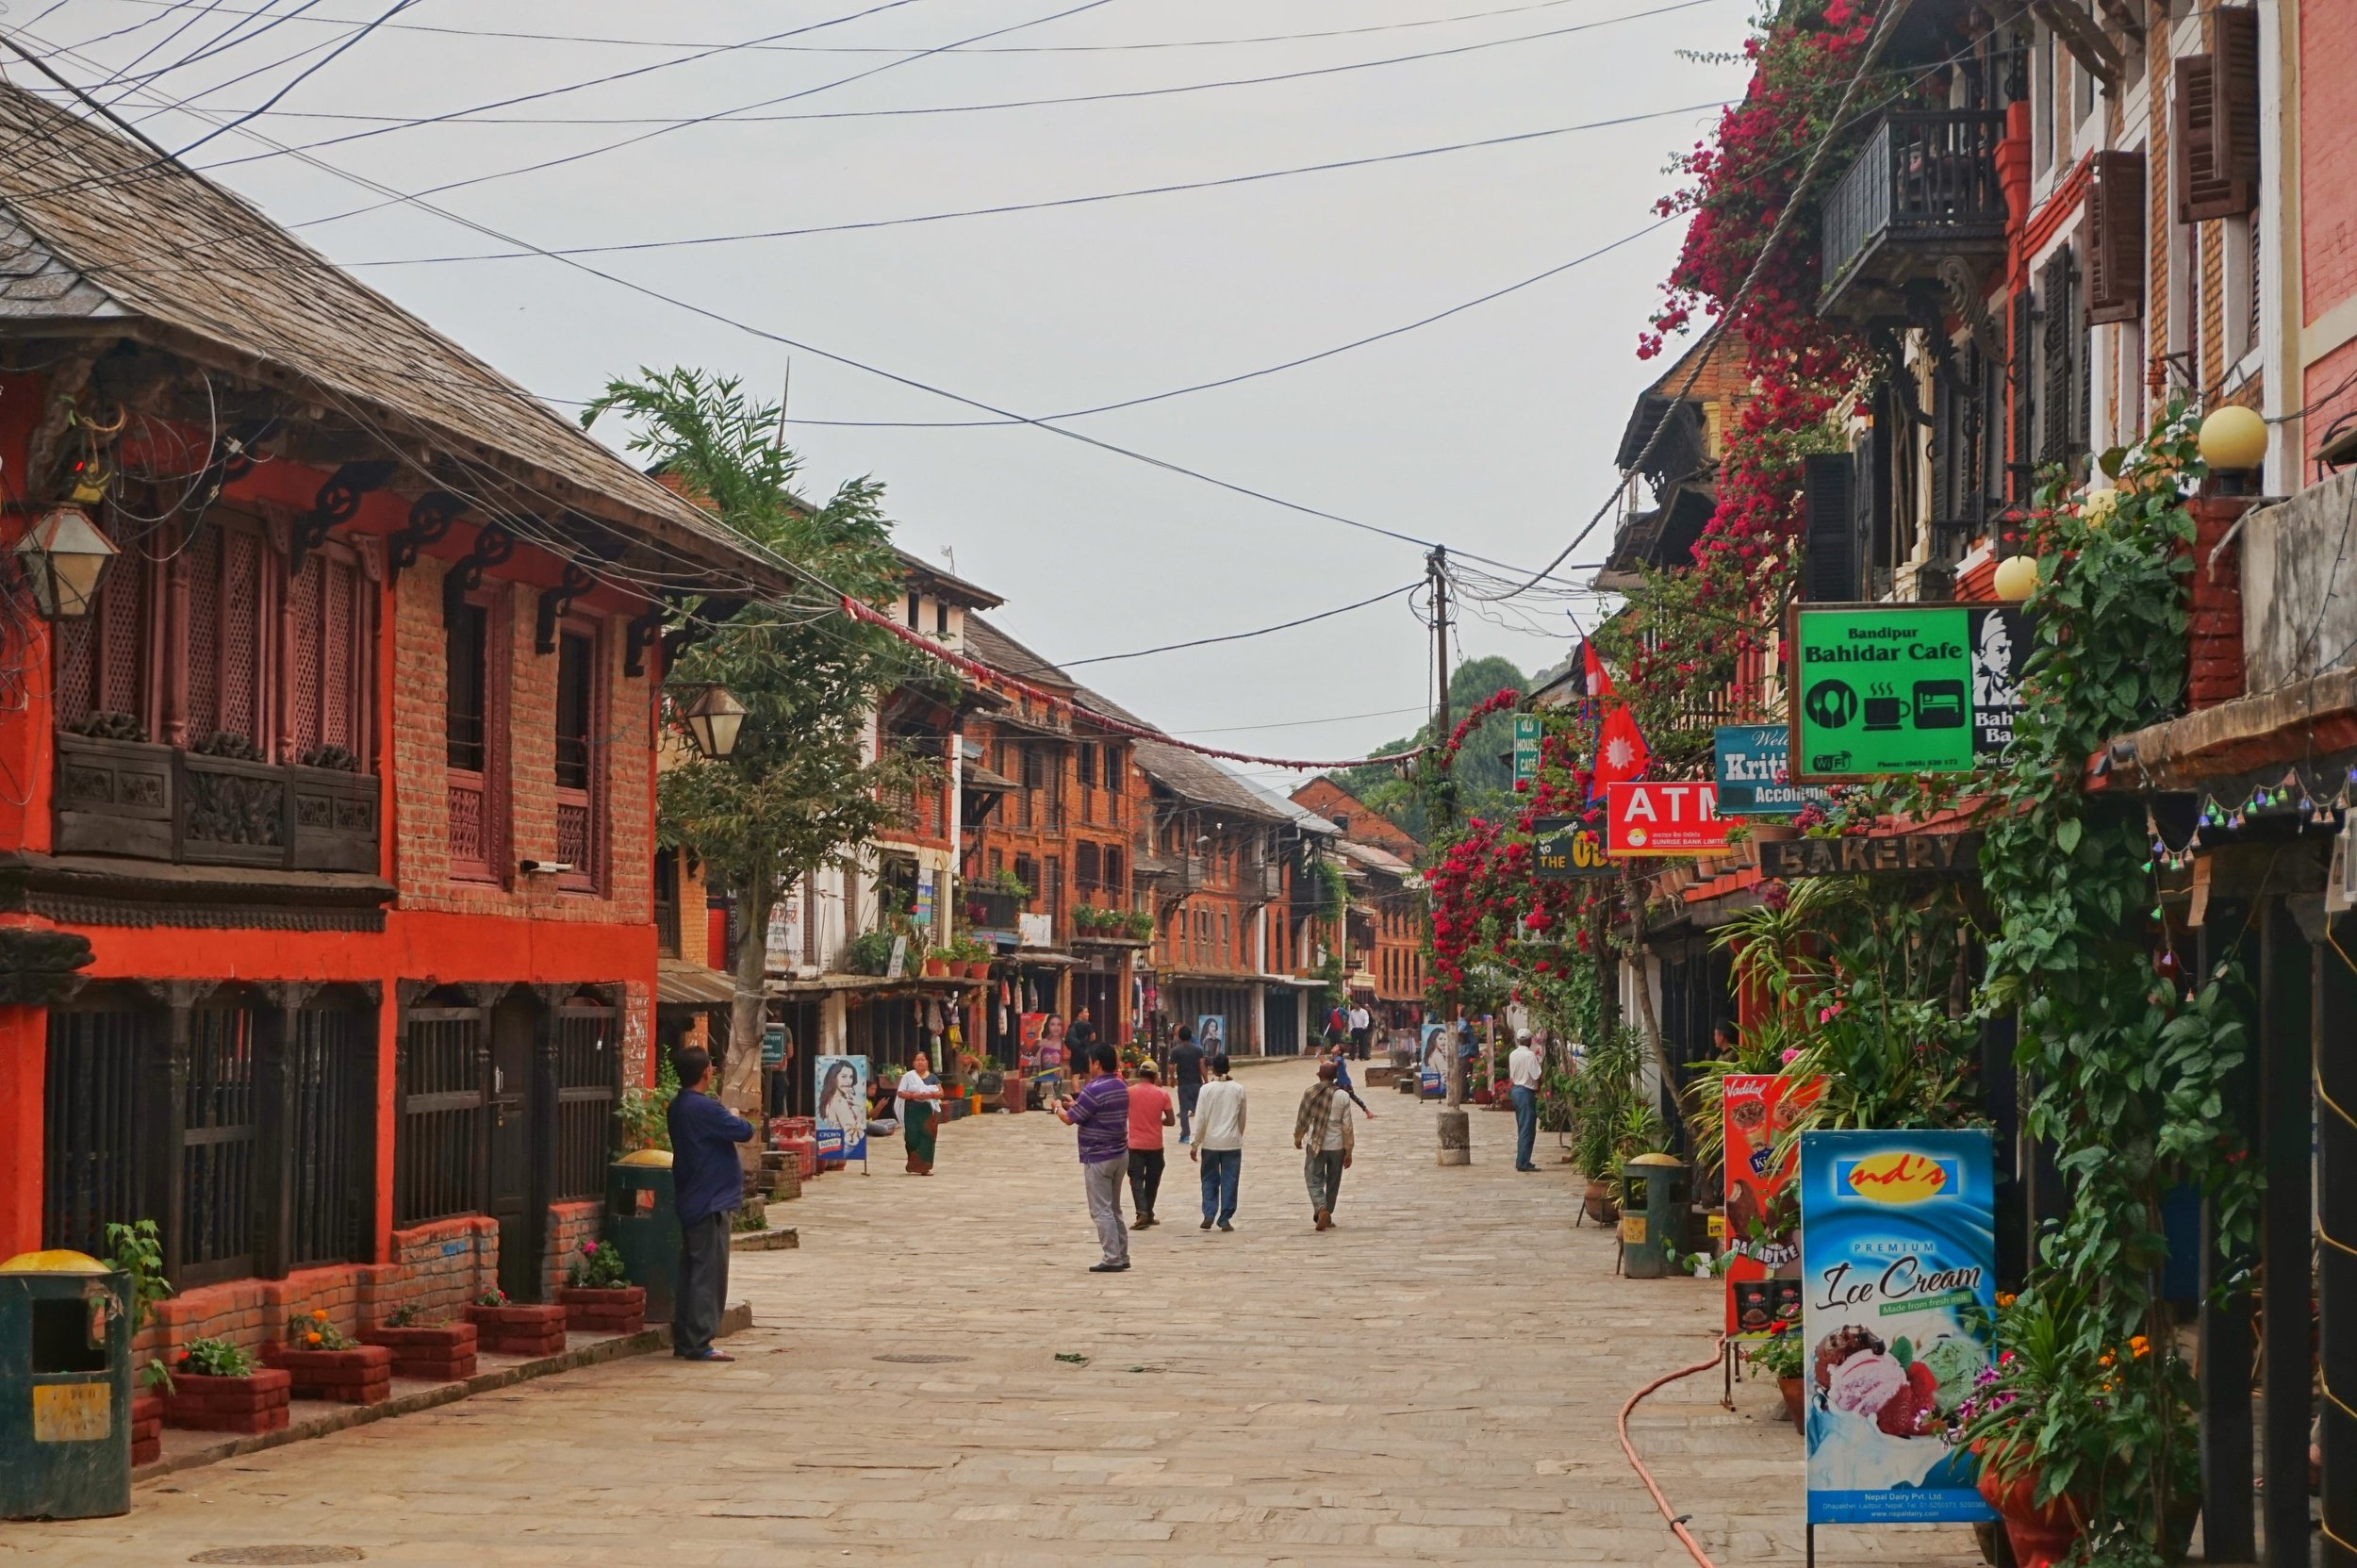 Pedestrian street in Bandipur, Nepal